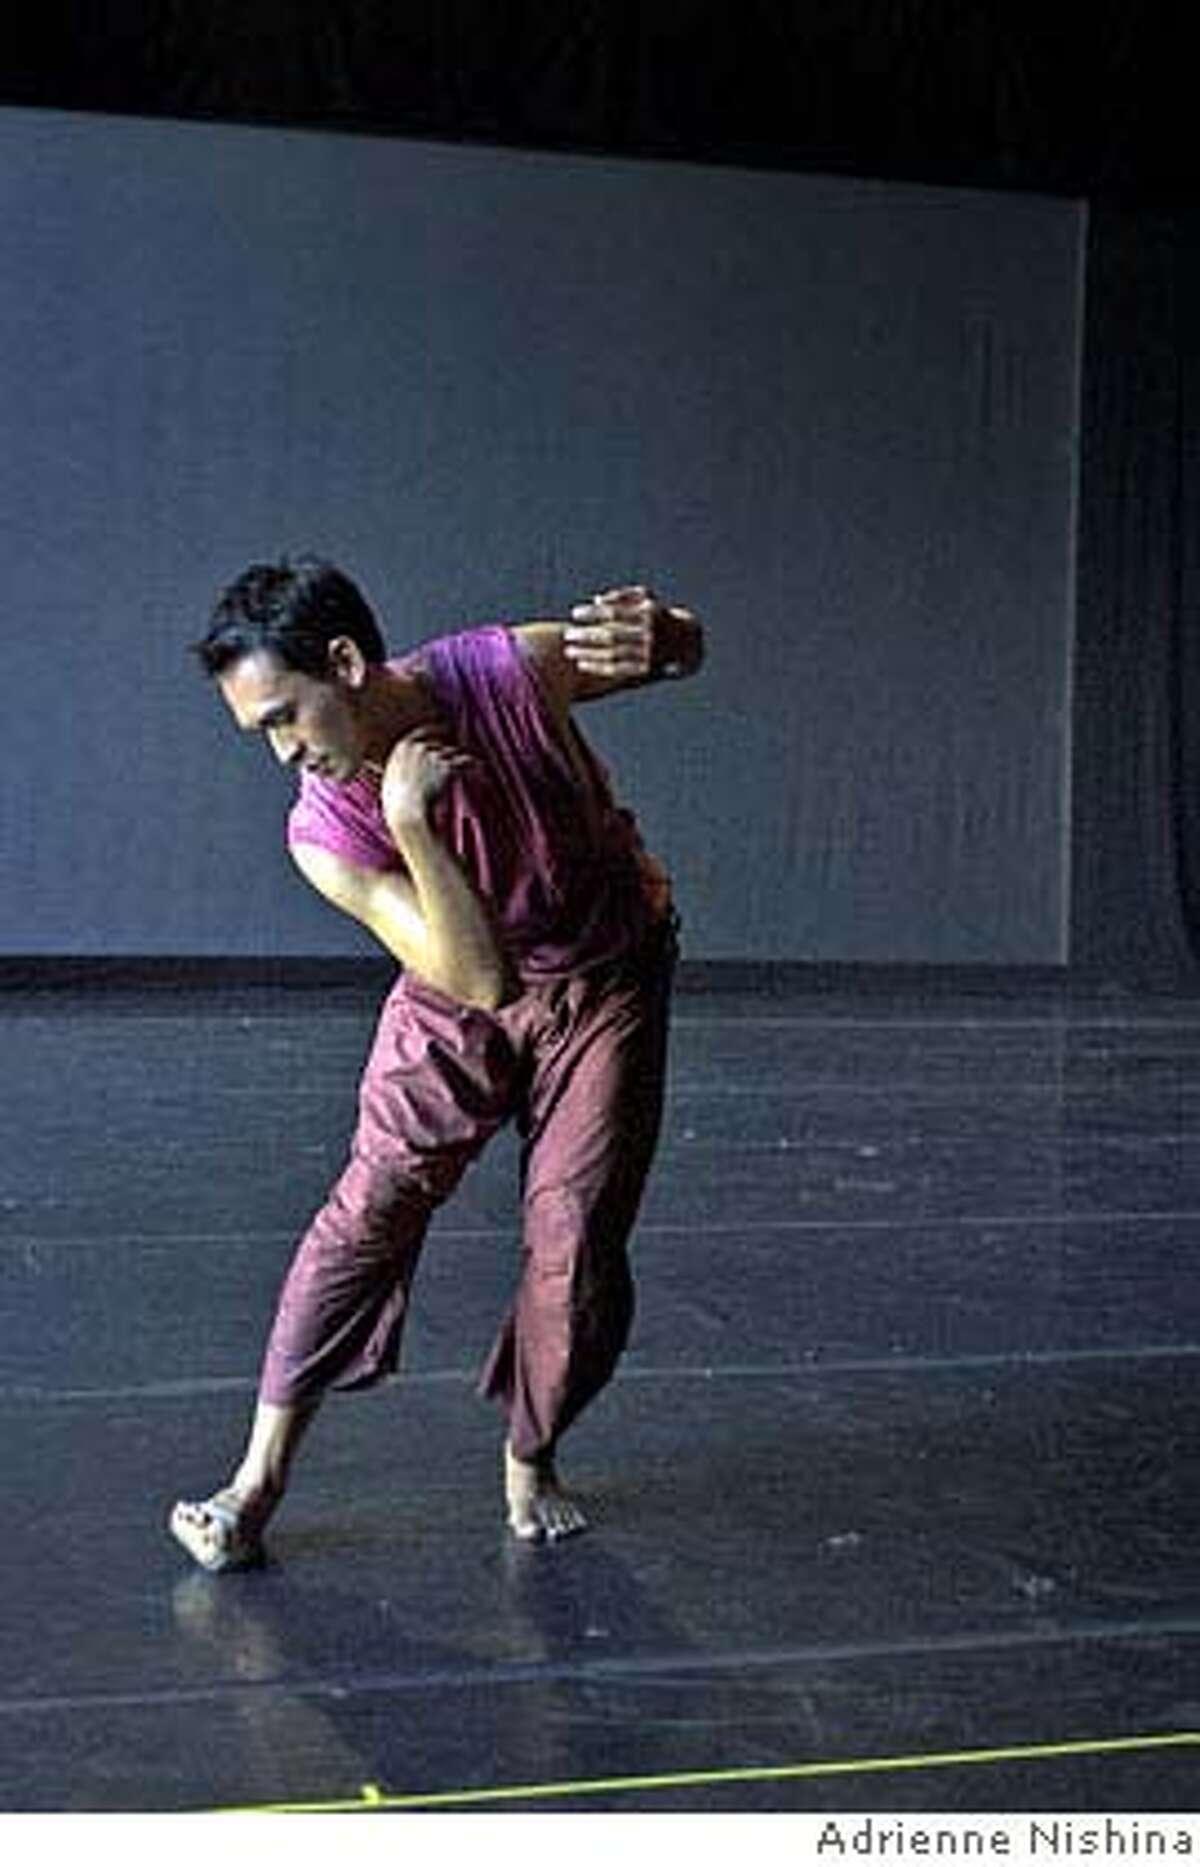 Photo of dancer Manuelito Biag. Credit: Adrienne Nishina